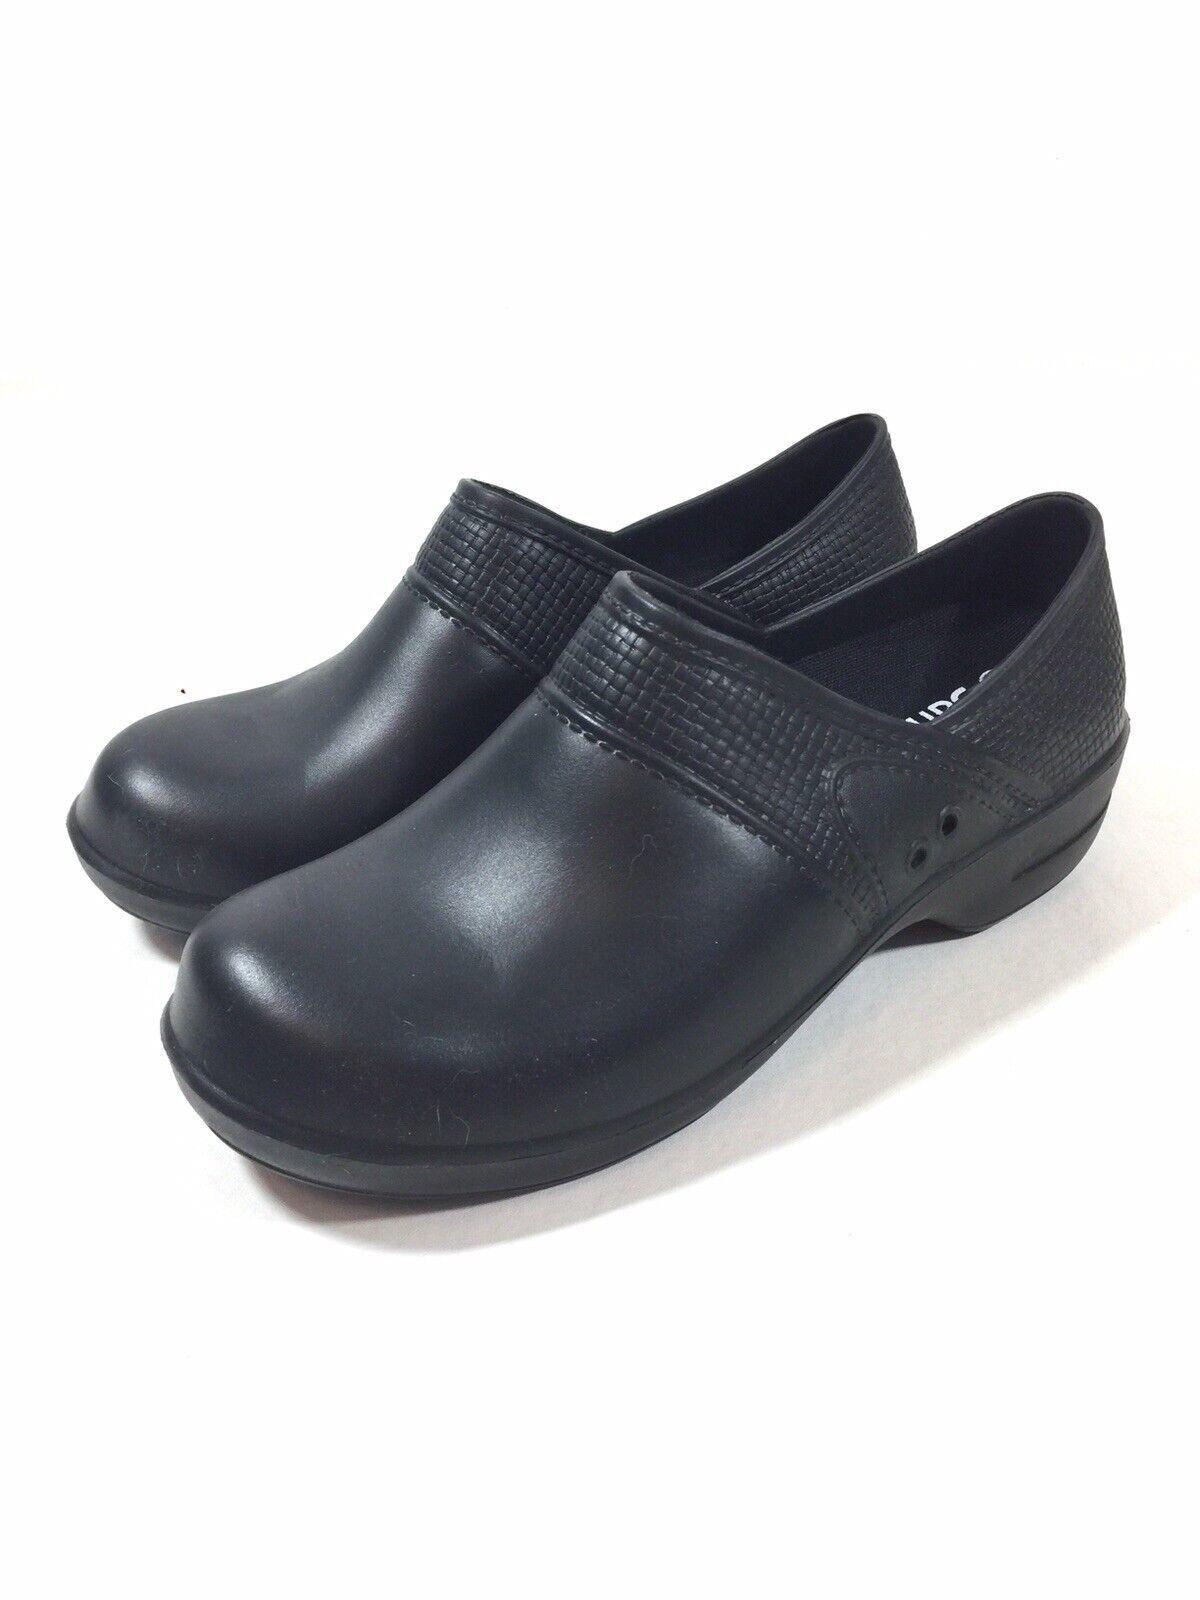 Sanita para Mujer Nuevo Sin Etiquetas Negro de goma antideslizante Zueco Zapatos Talla 41 EU 10.5 nos